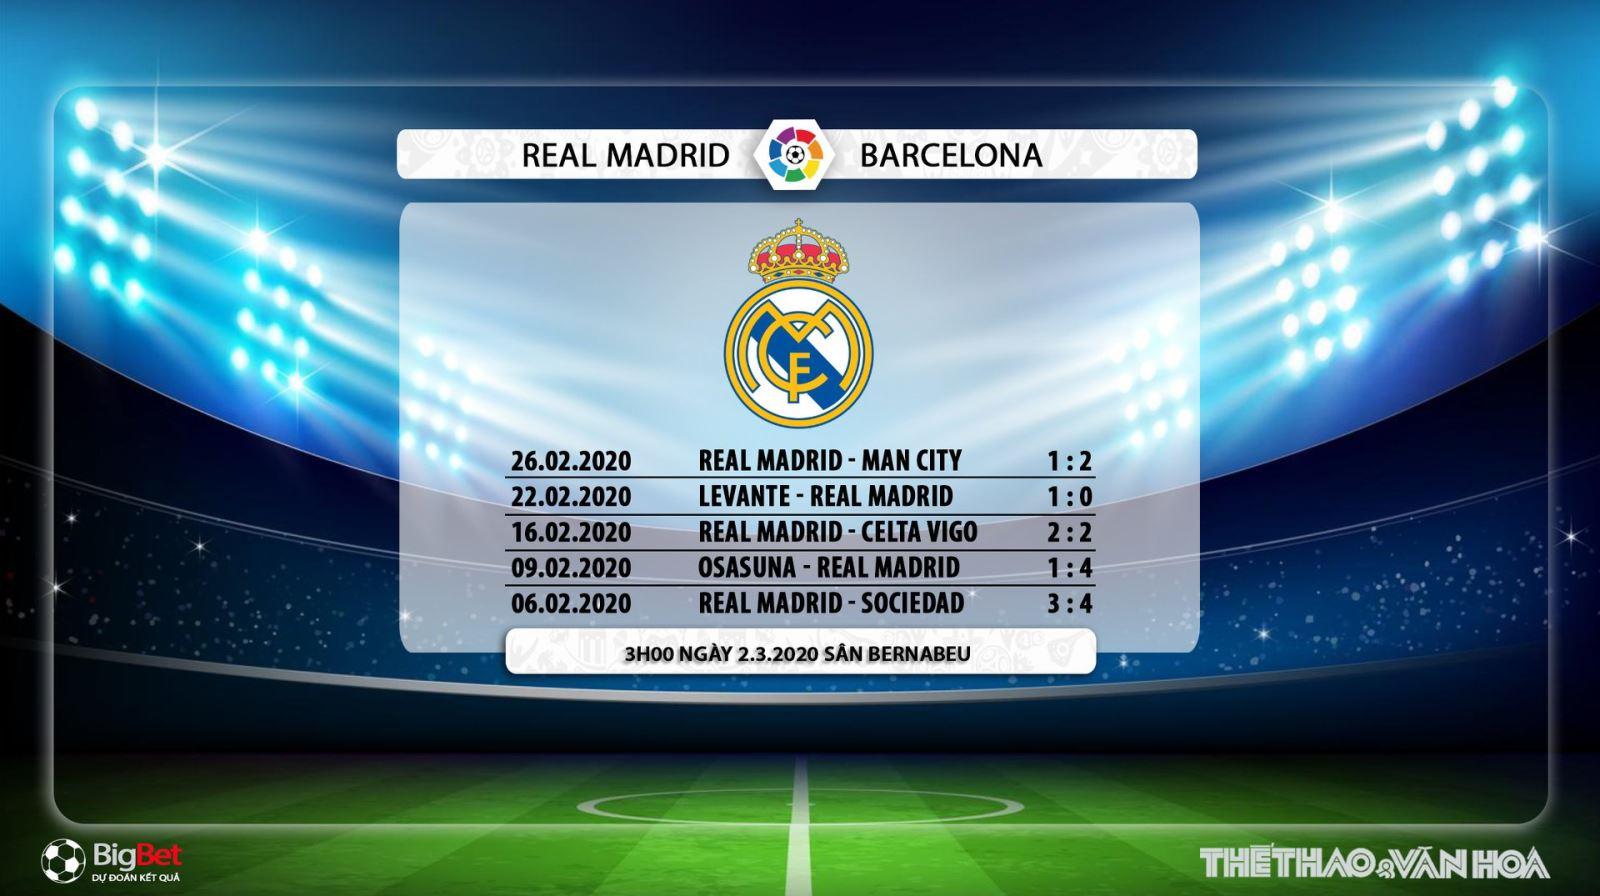 Real Madrid vs Barcelona, Real Madrid, Barca, Barcelona, nhận định Real Madrid vs Barcelona, kinh dien, trực tiếp Real Madrid vs Barcelona, soi kèo Real Madrid vs Barcelona, BĐTV, SSPORT